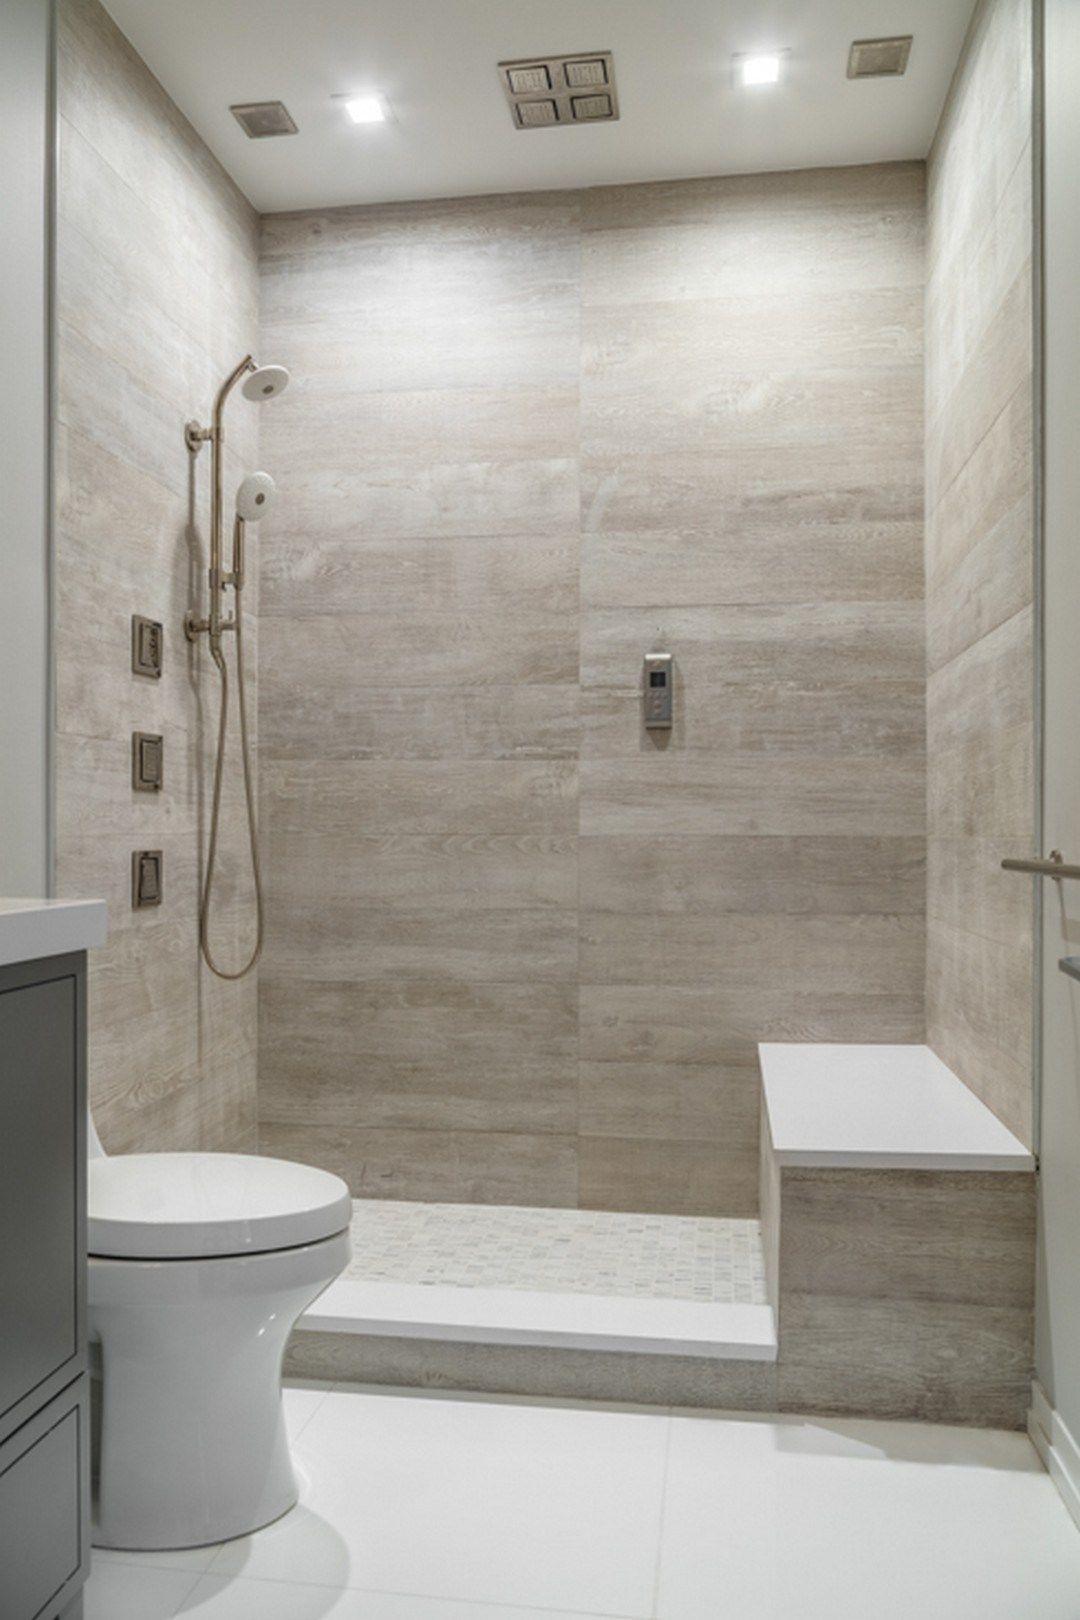 99 New Trends Bathroom Tile Design Inspiration 2017 31 99architecture Small Bathroom Bathrooms Remodel Bathroom Remodel Shower